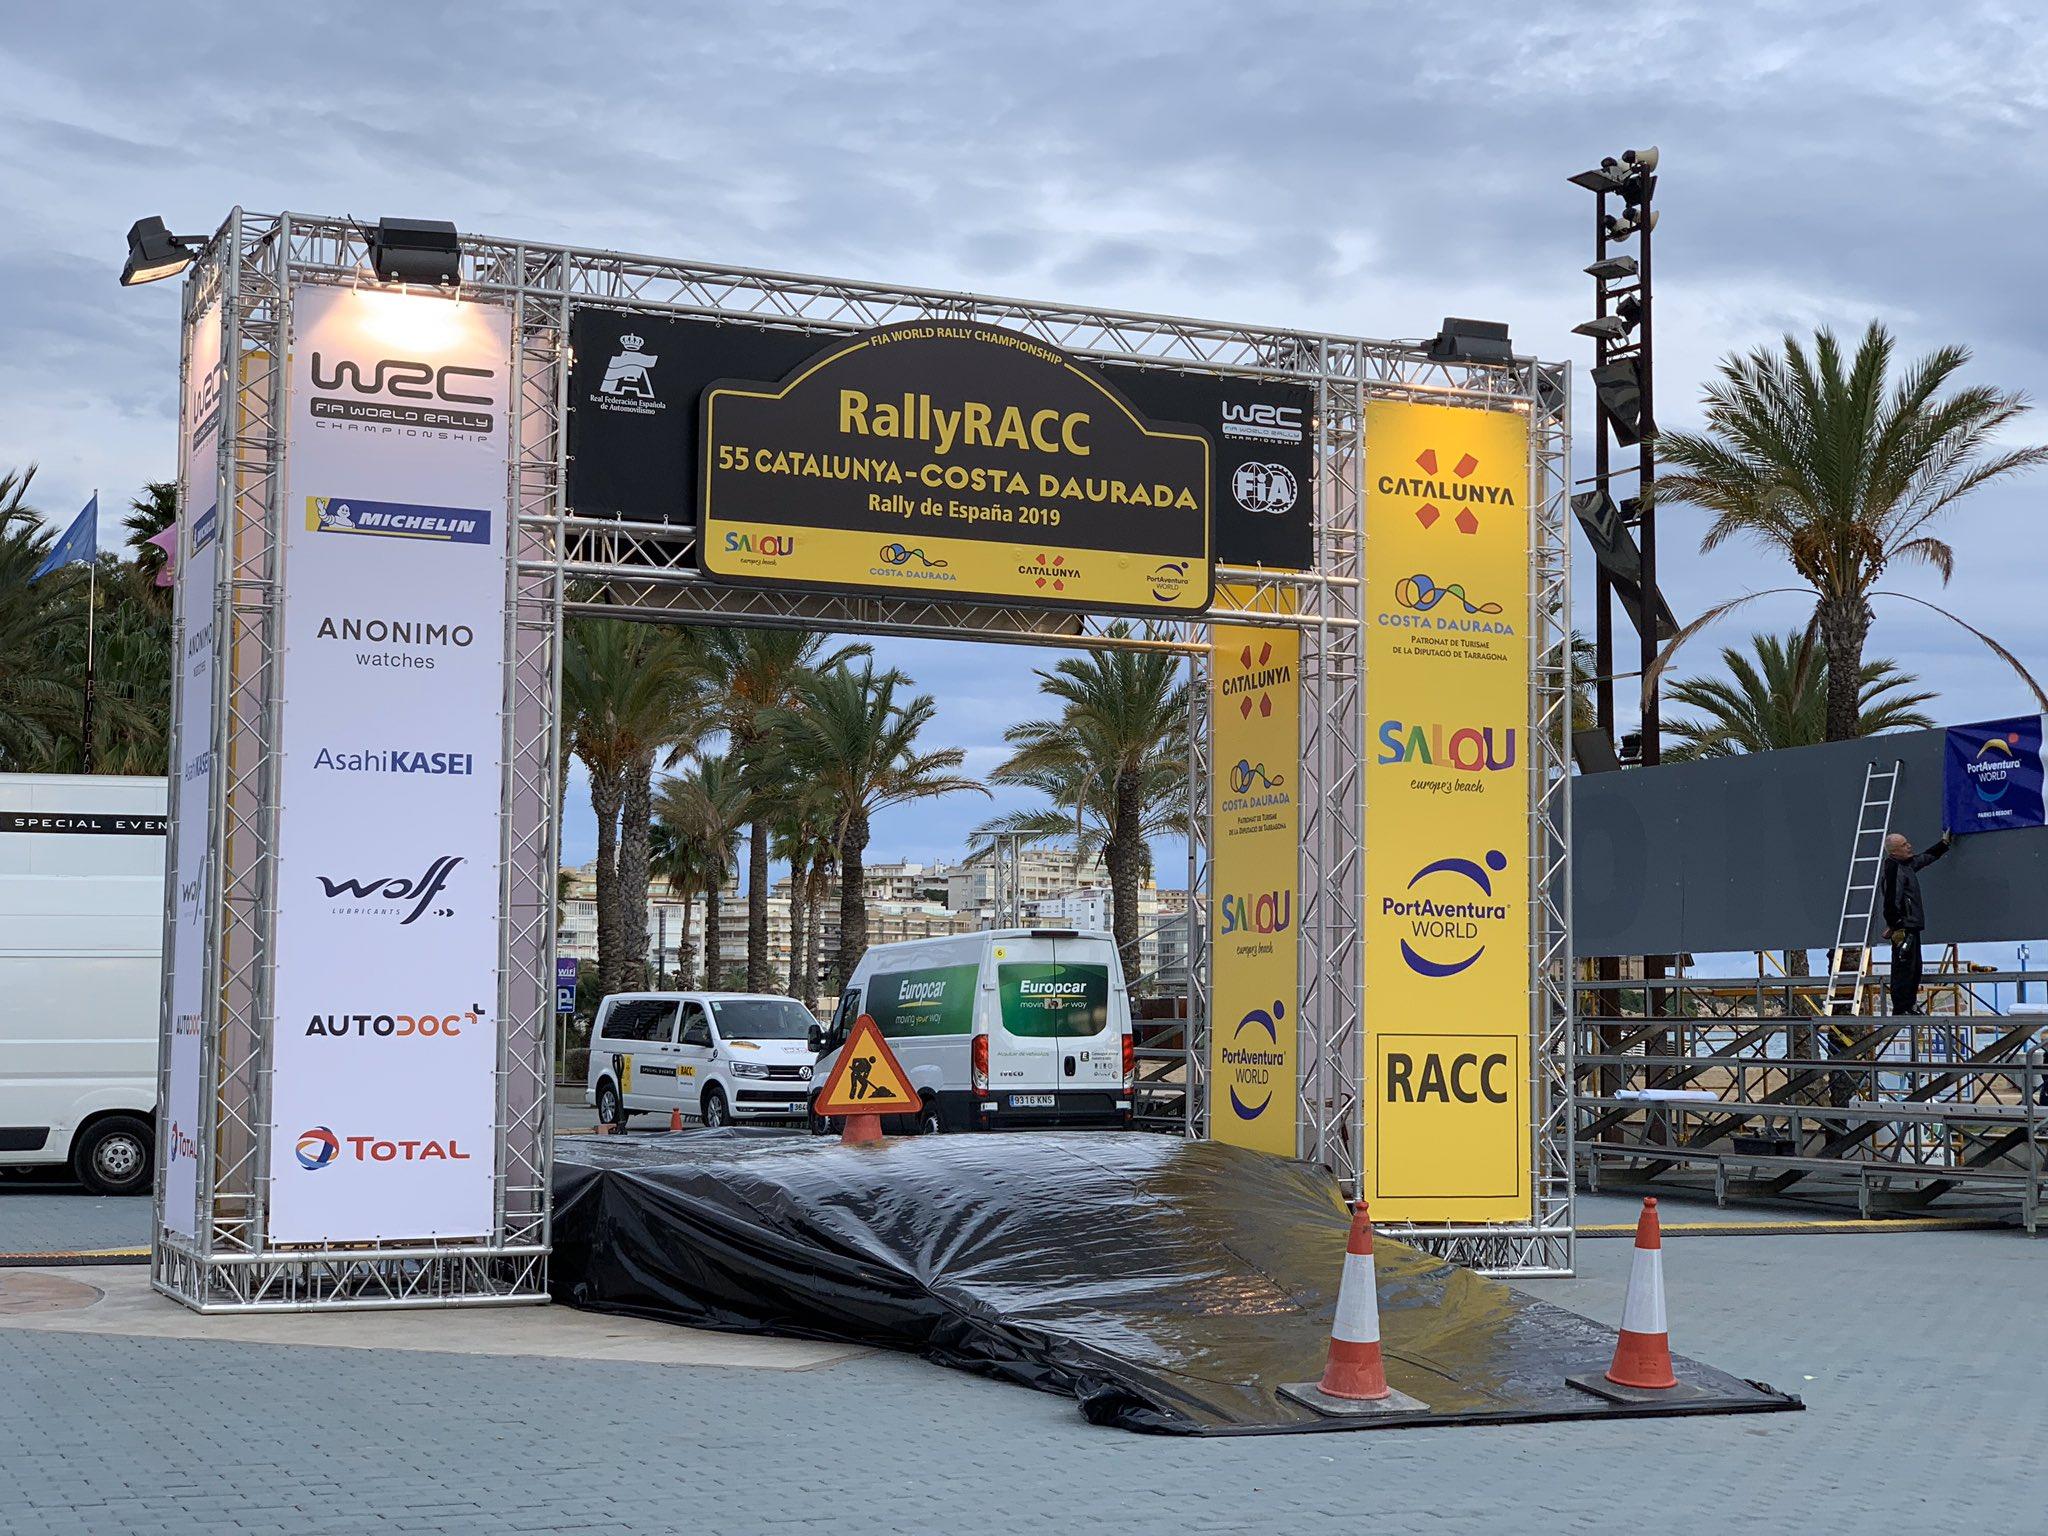 WRC: 55º RallyRACC Catalunya - Costa Daurada - Rally de España [24-27 Octubre] - Página 2 EHanDxkWoAENn0n?format=jpg&name=4096x4096